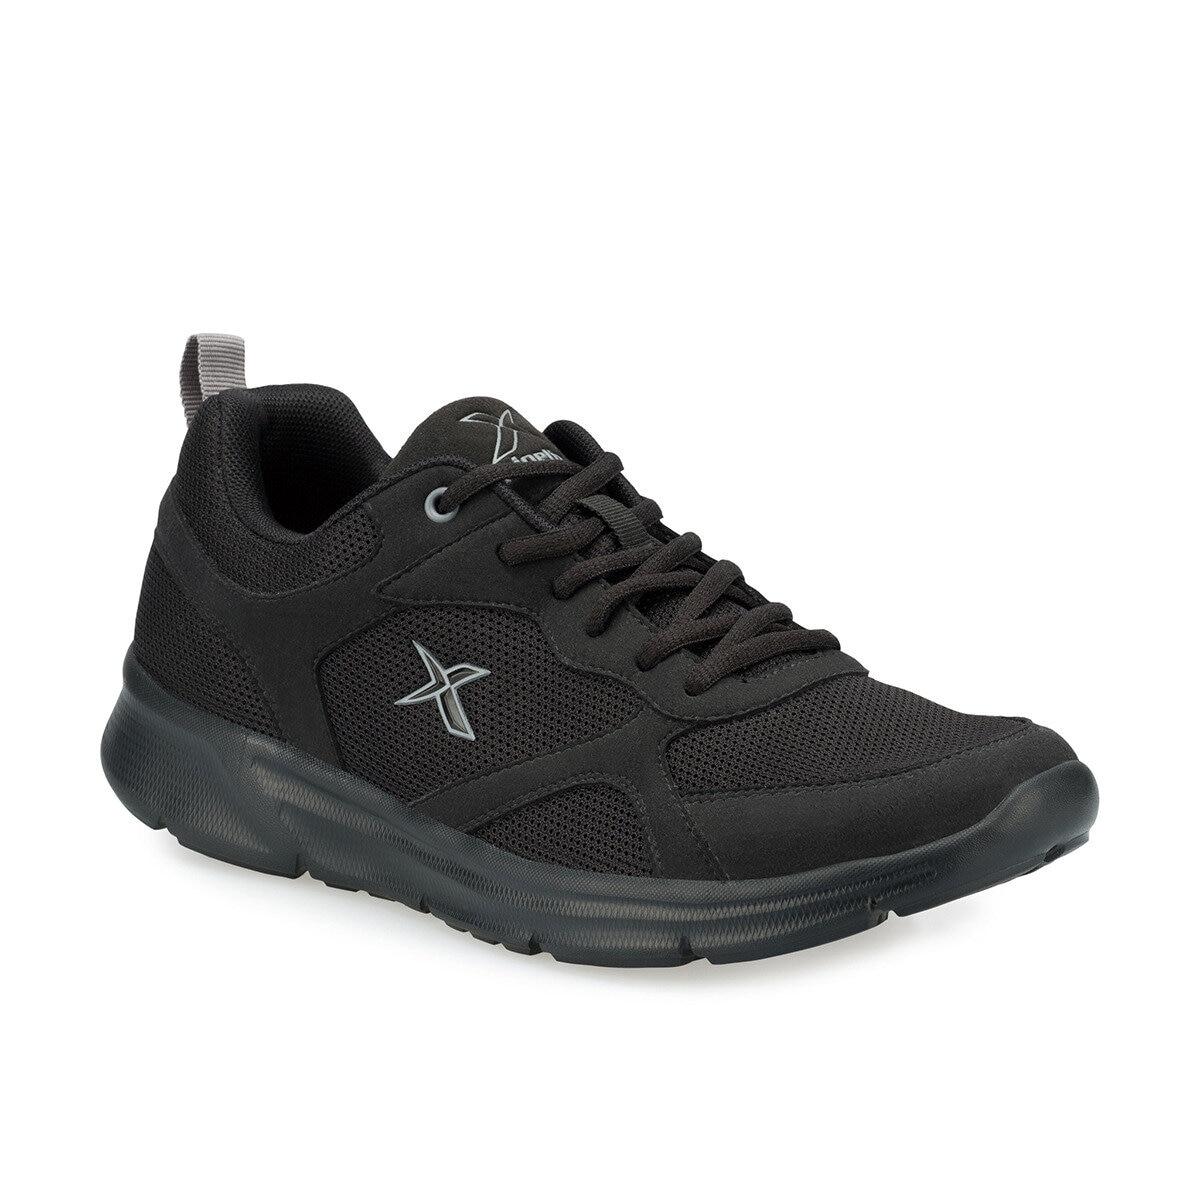 FLO ROLLS MESH M Black Men 'S Sneaker Shoes KINETIX